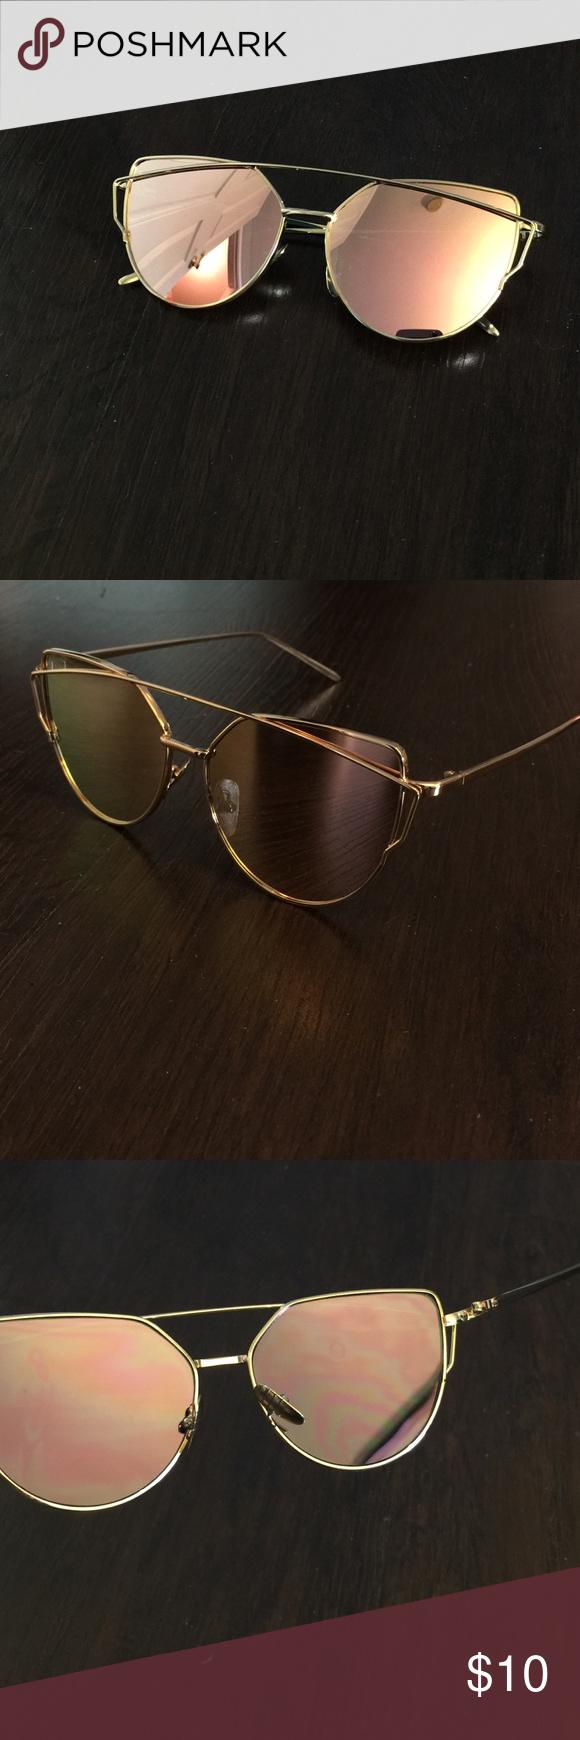 ☀️Rose and Gold Aviator Style Sunglasses ☀️